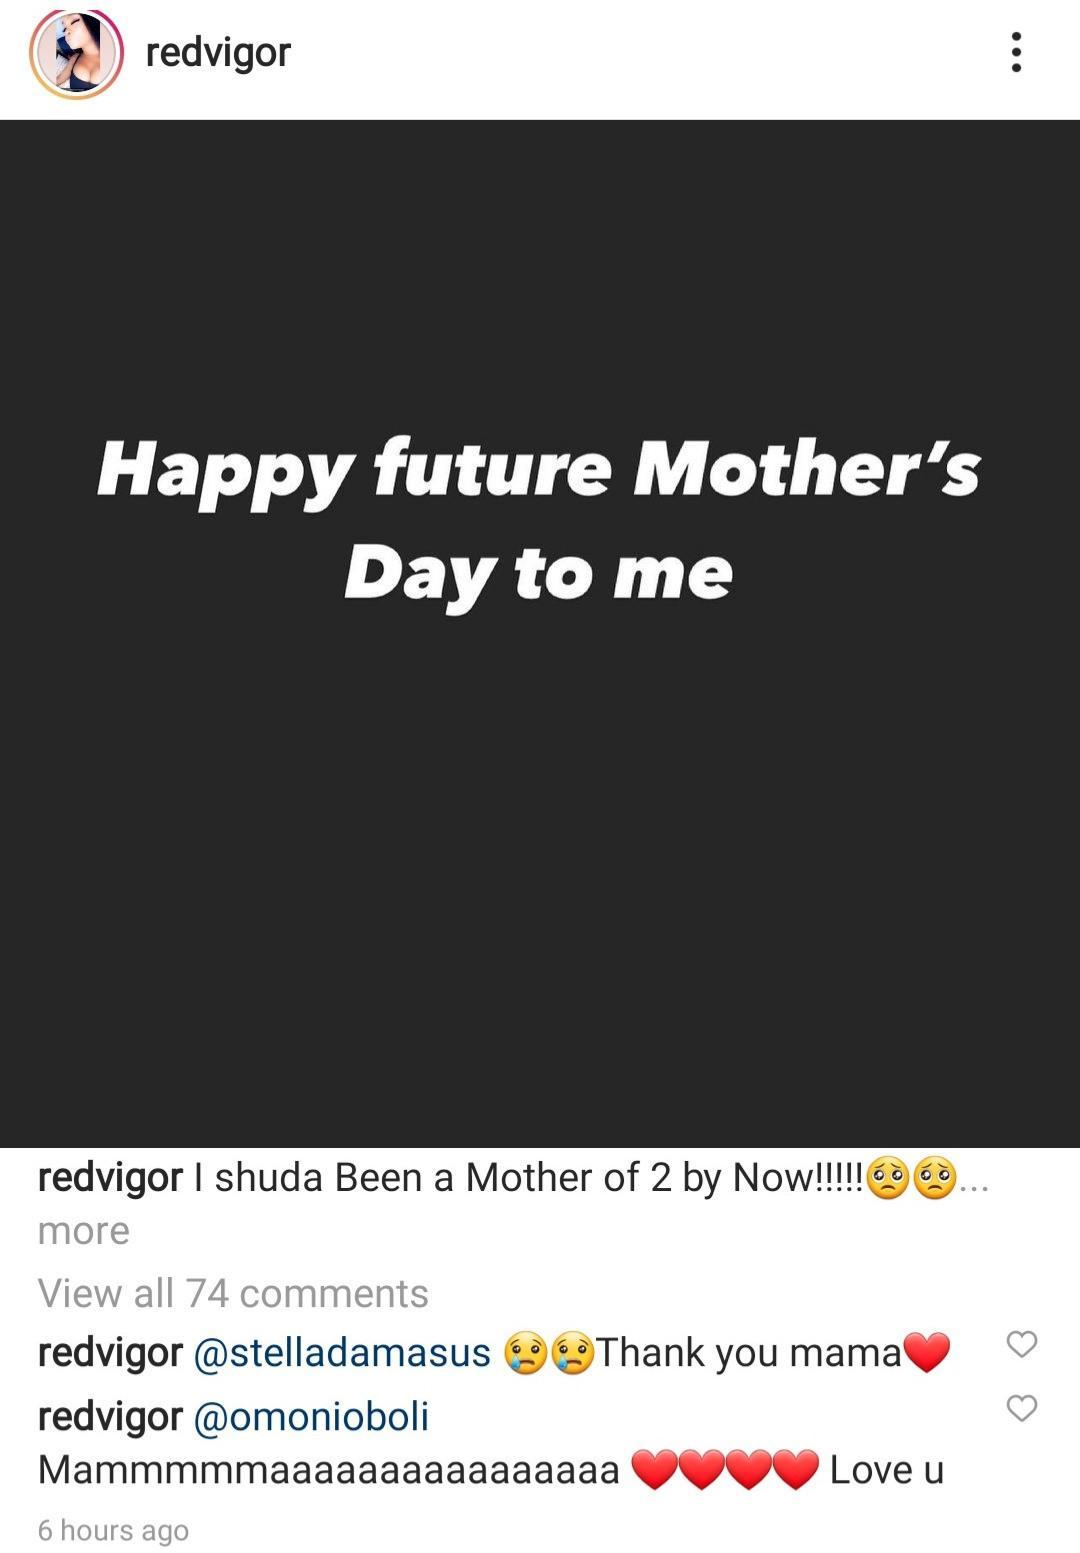 Maureen Esisi future mother's